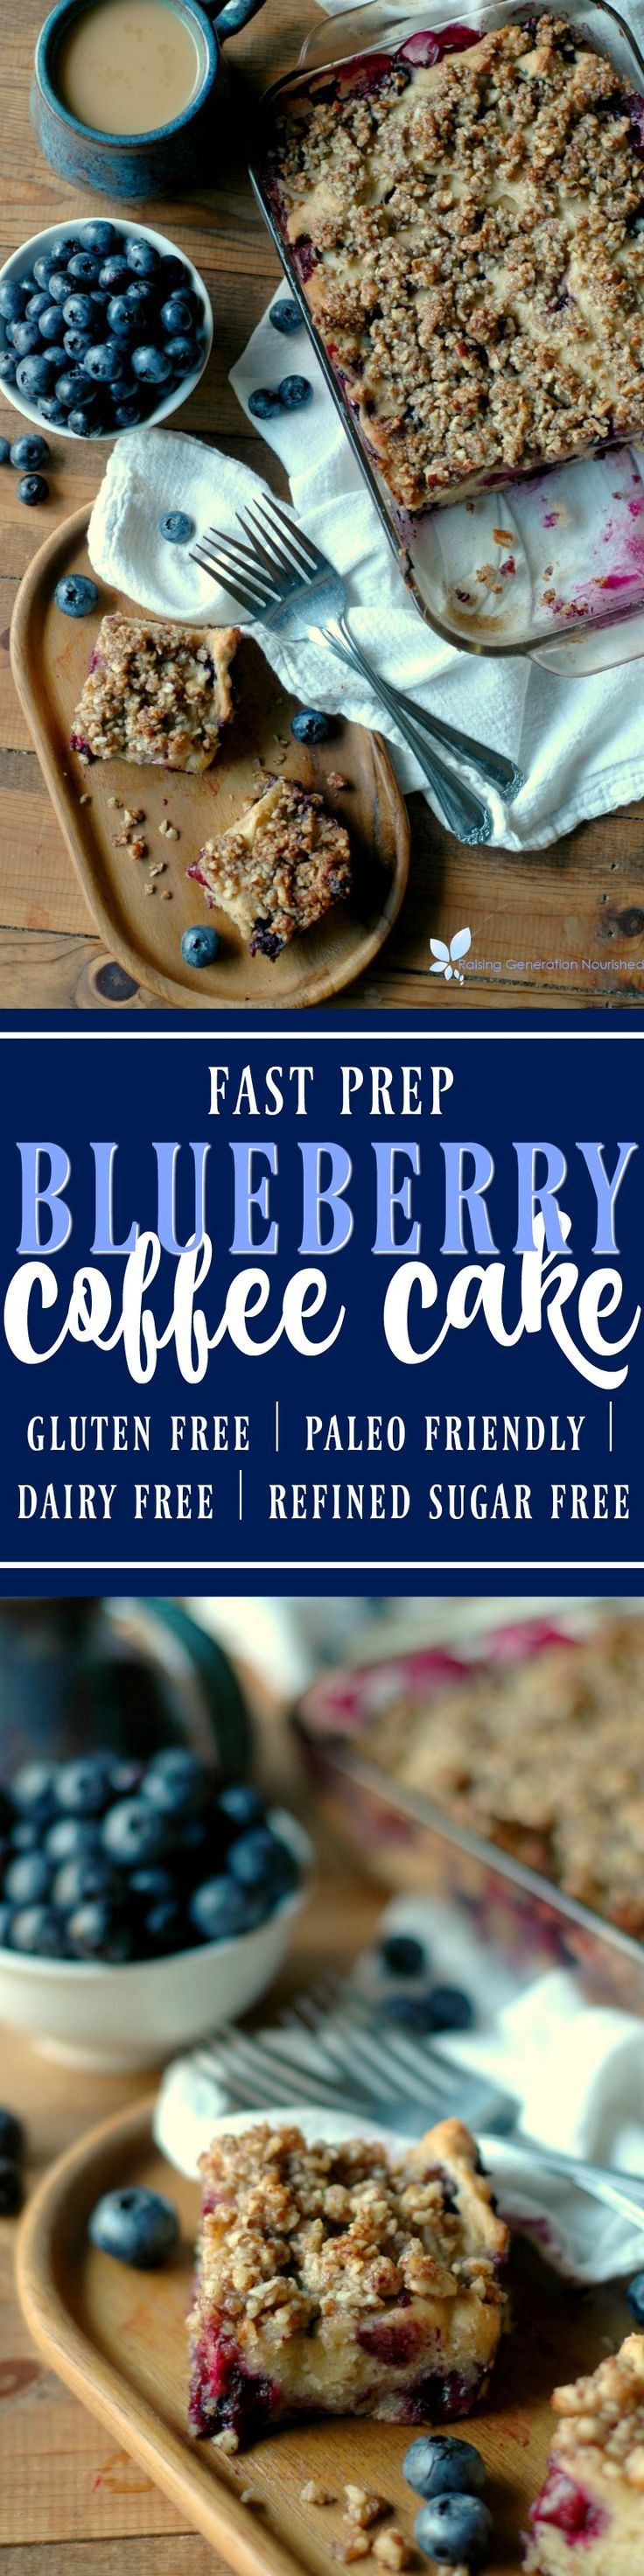 Fast prep blueberry coffee cake gluten free dairy free